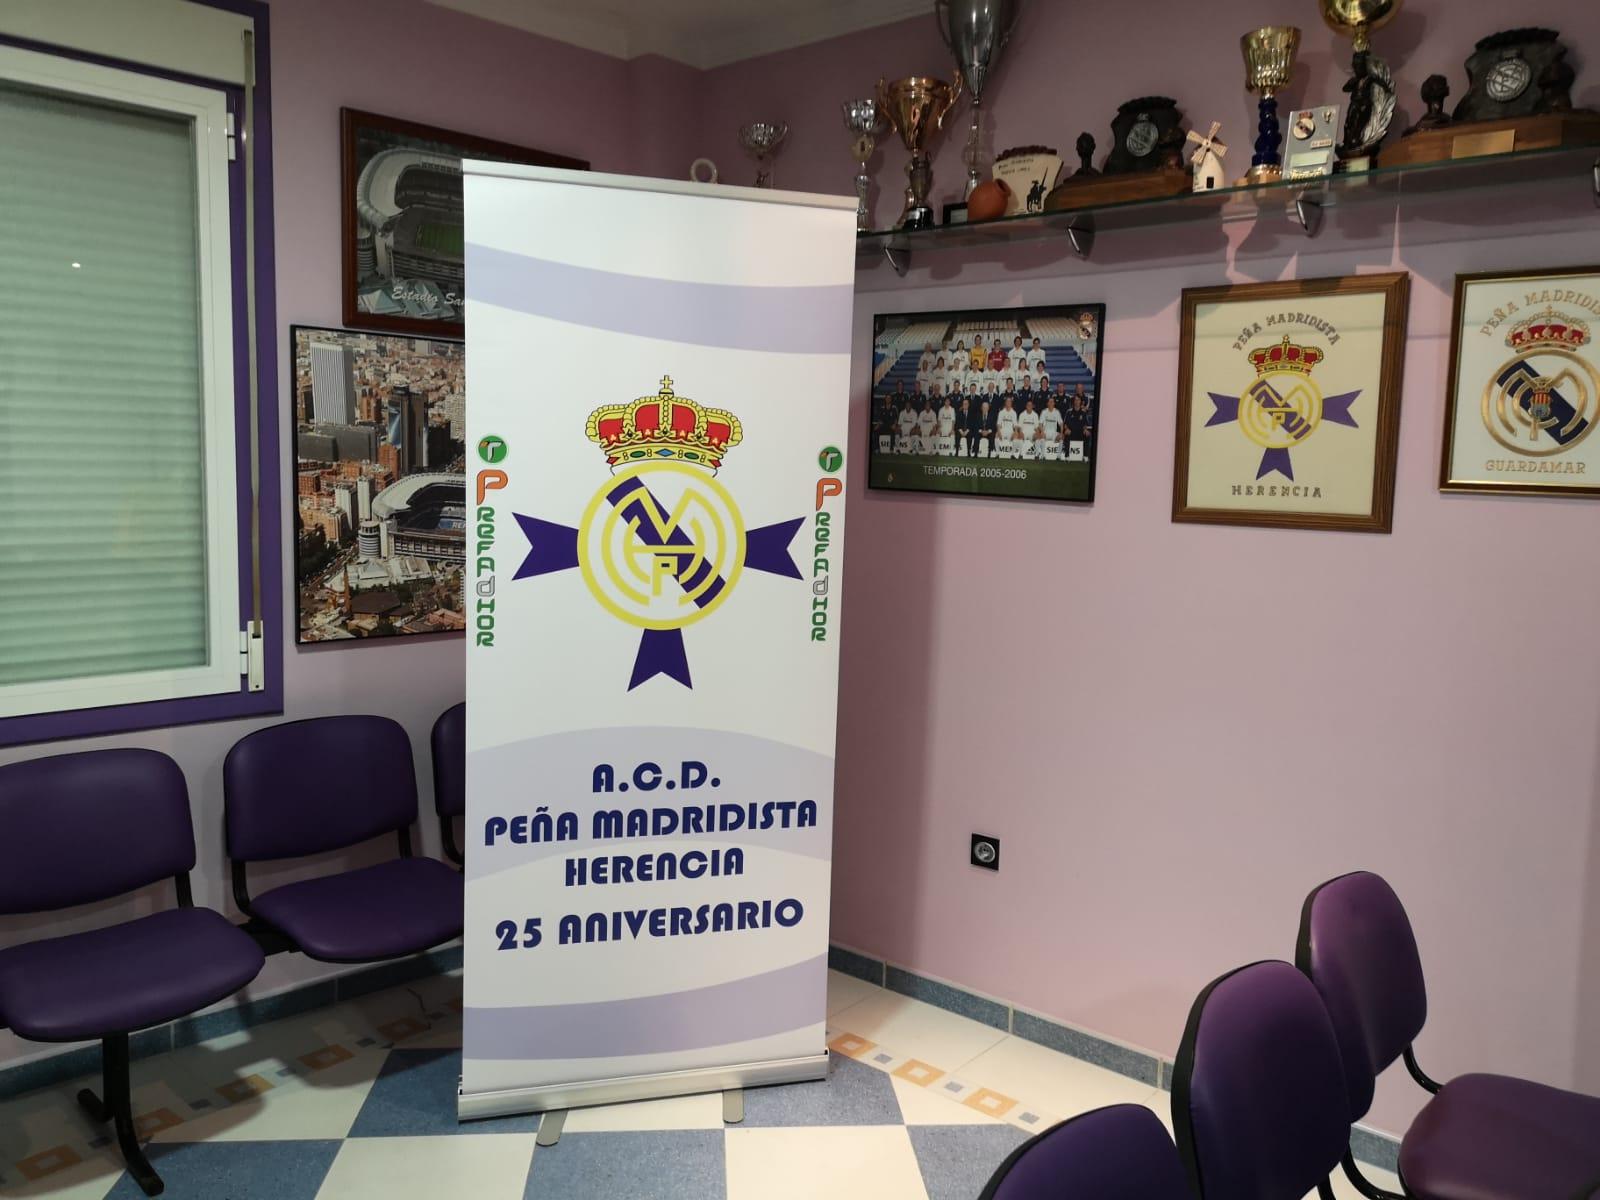 25 aniversario peña madridista Herencia - Torneo de Minigolf 25 aniversario de la Peña Madridista de Herencia